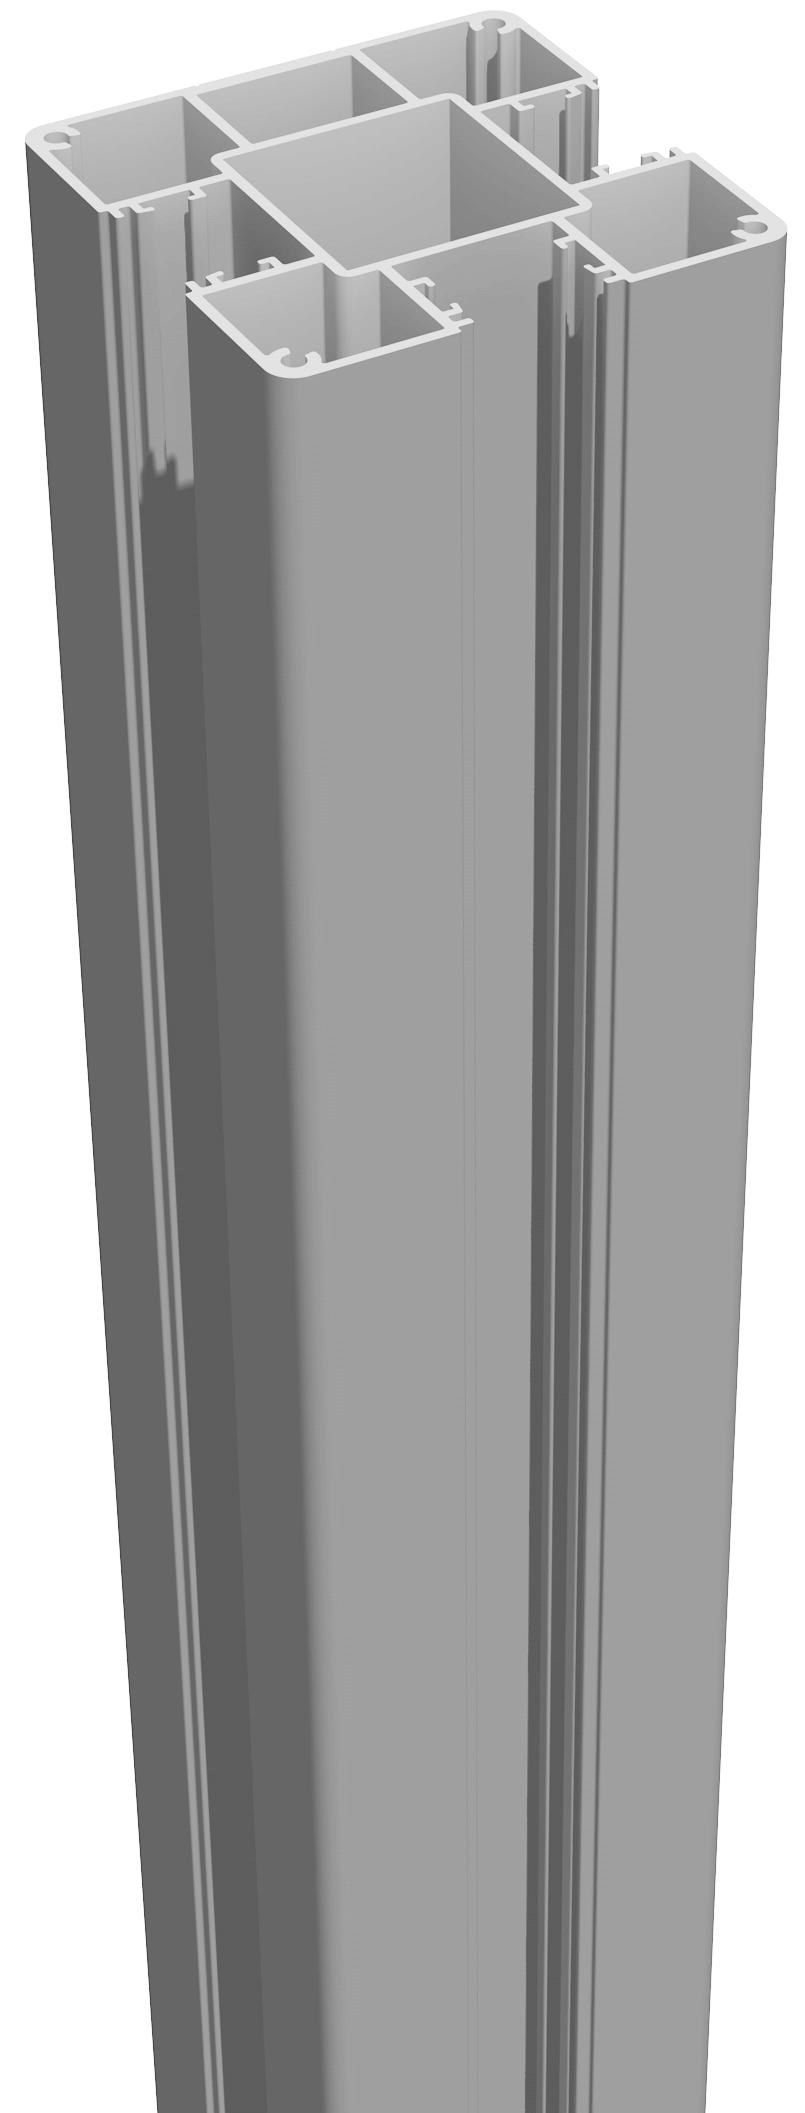 grojalumino alu stecksystem pfosten zum aufd beln 190. Black Bedroom Furniture Sets. Home Design Ideas